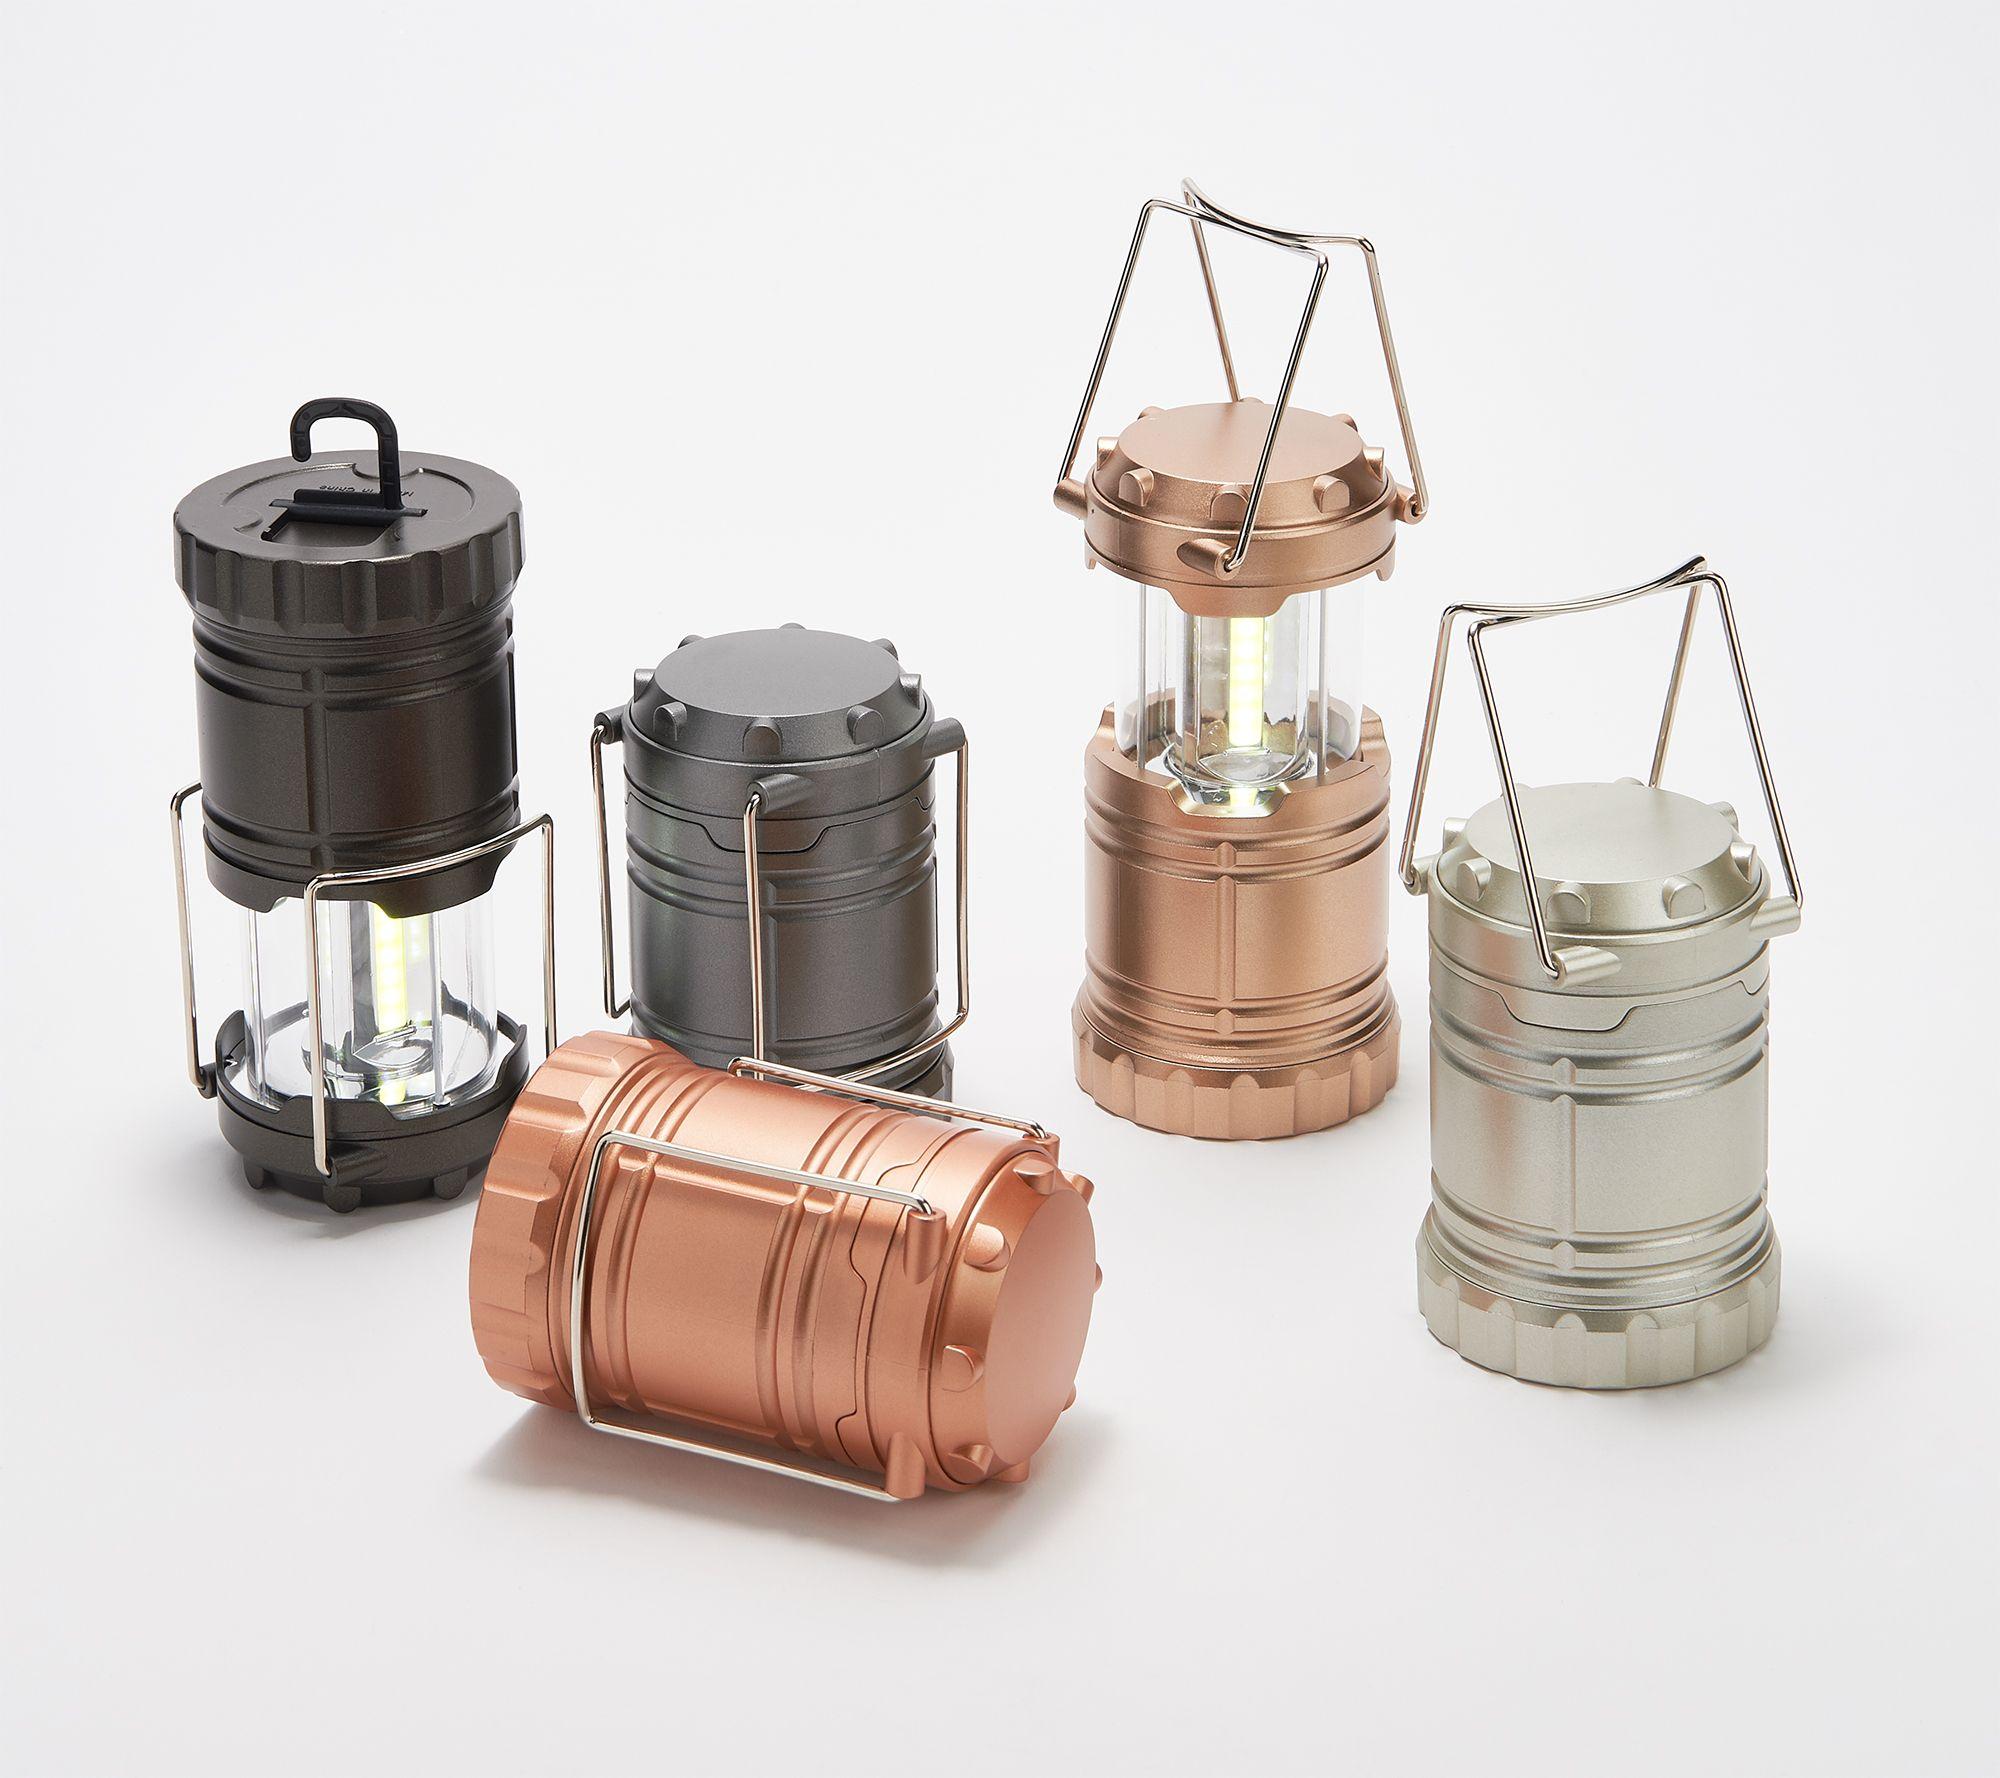 Securebrite Set Of 5 Mini Pop Up Led Lanterns With Hook Qvc Com